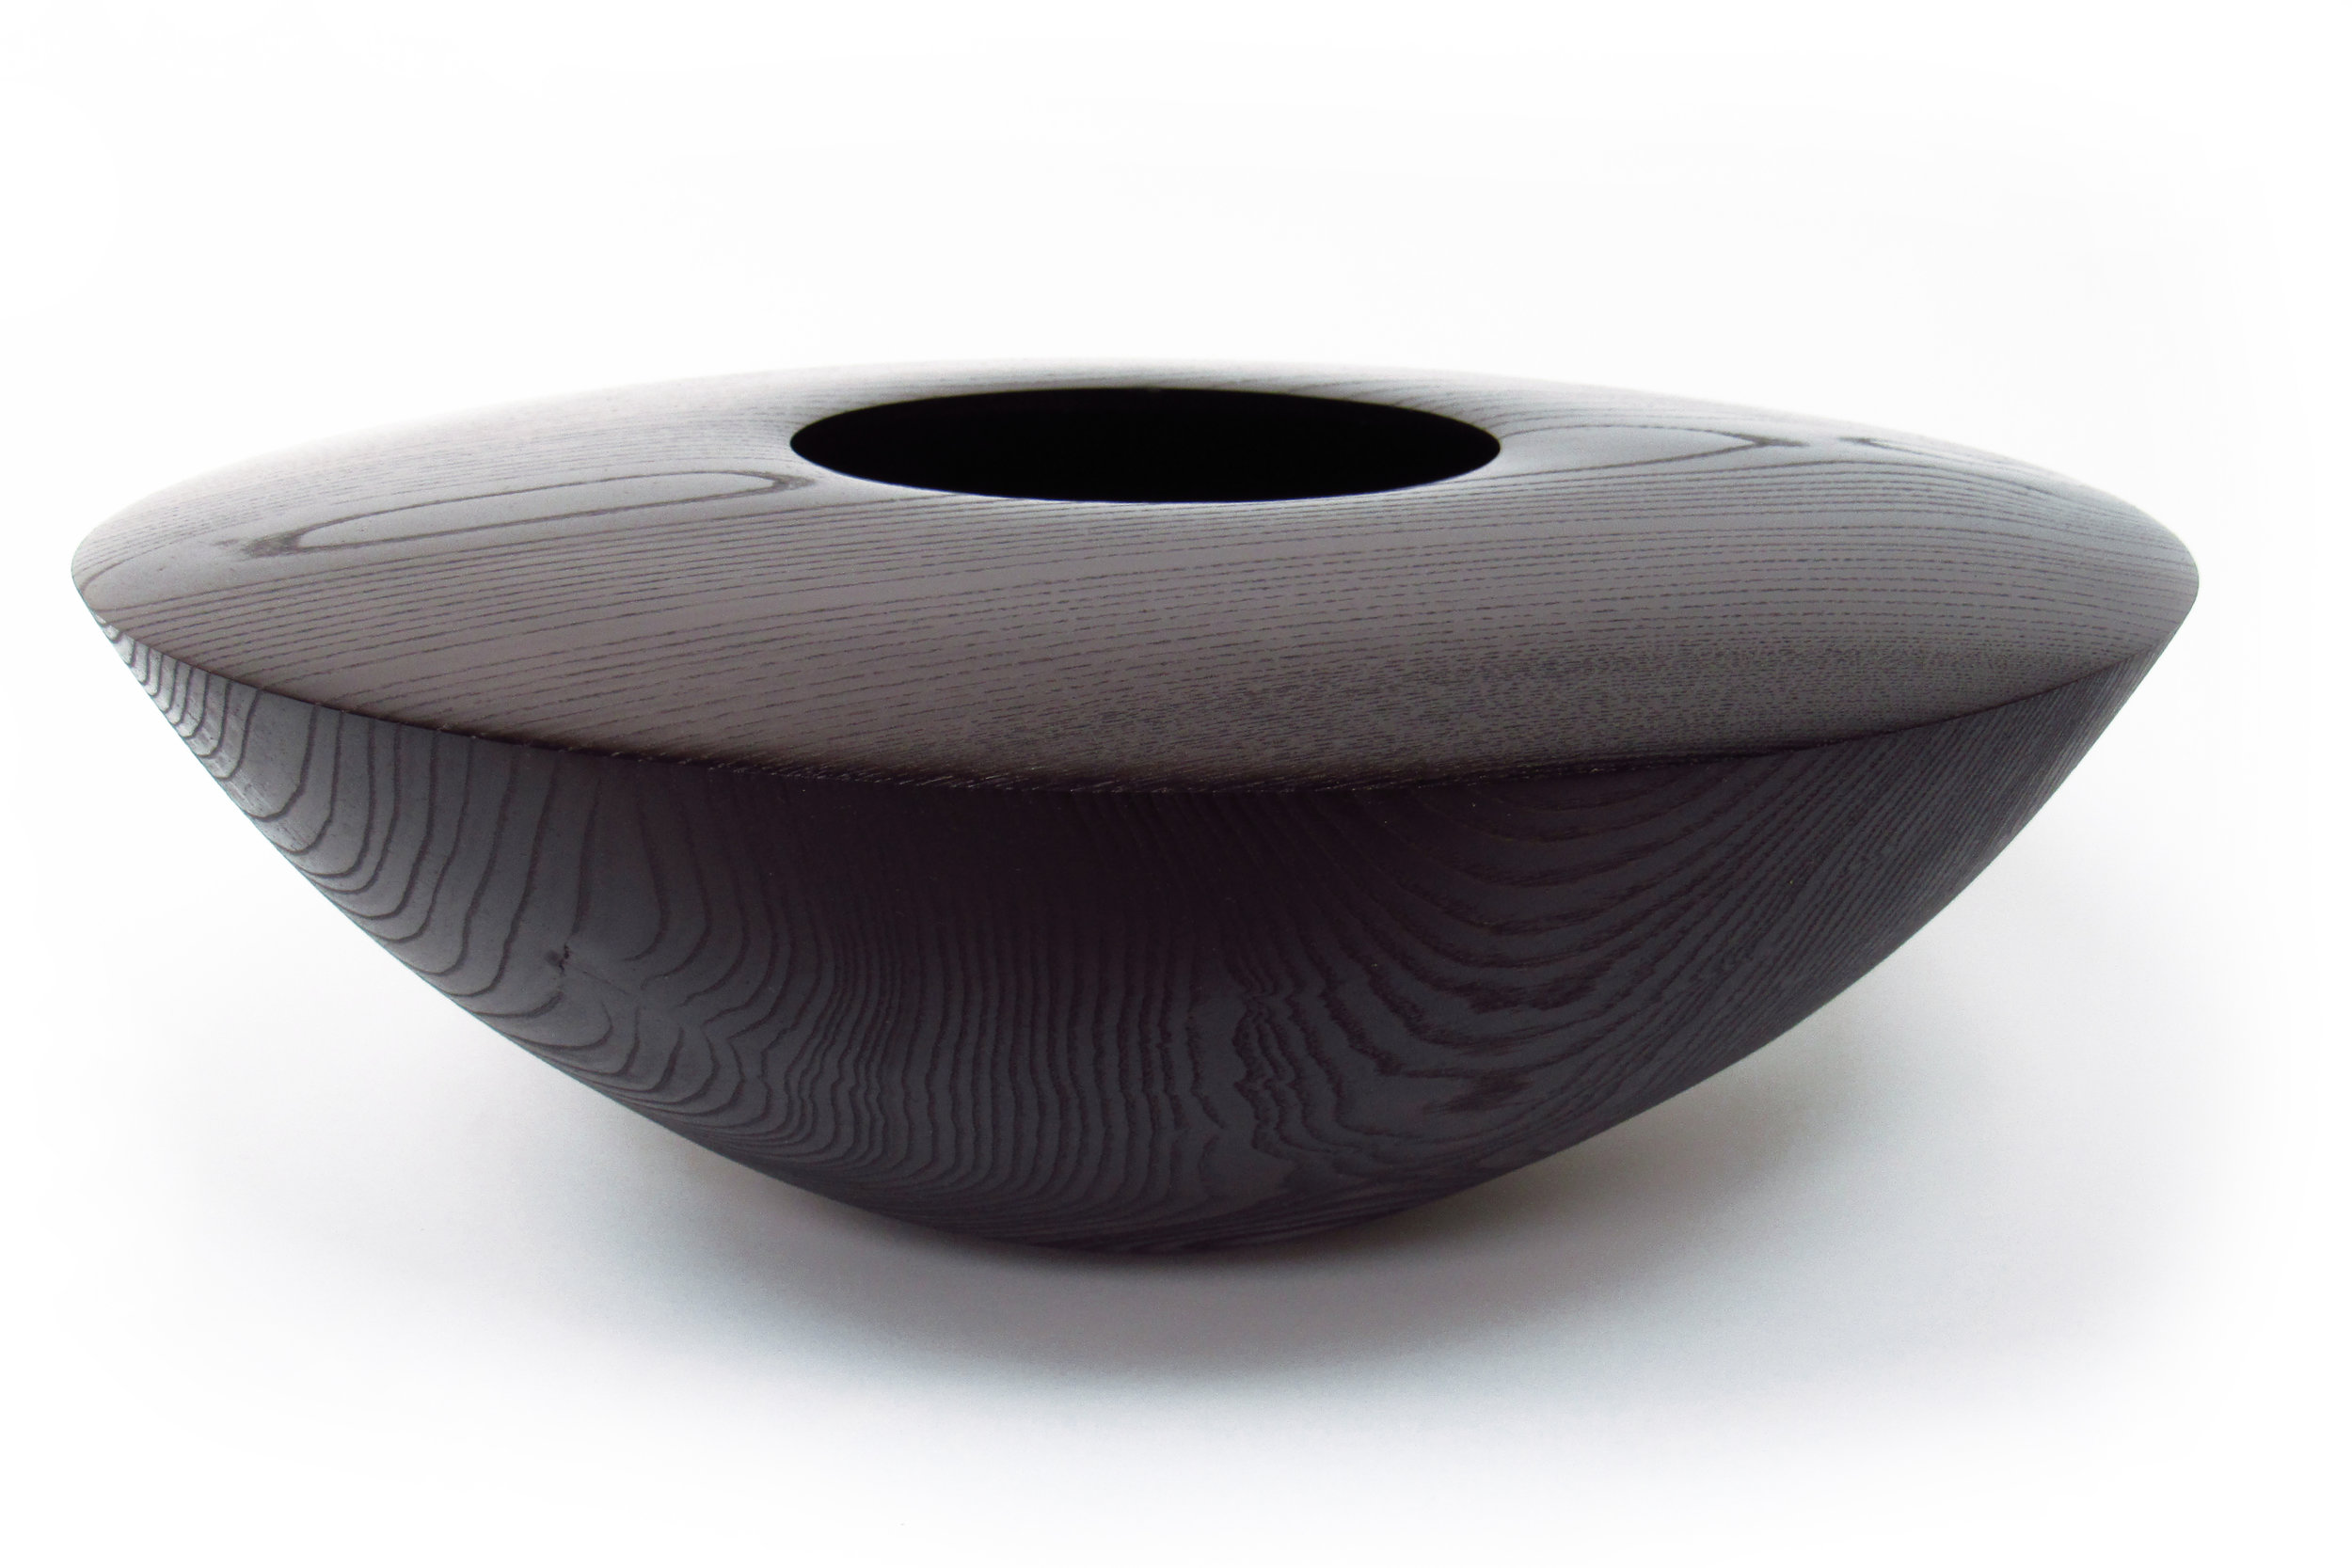 bowl_5-11.jpg